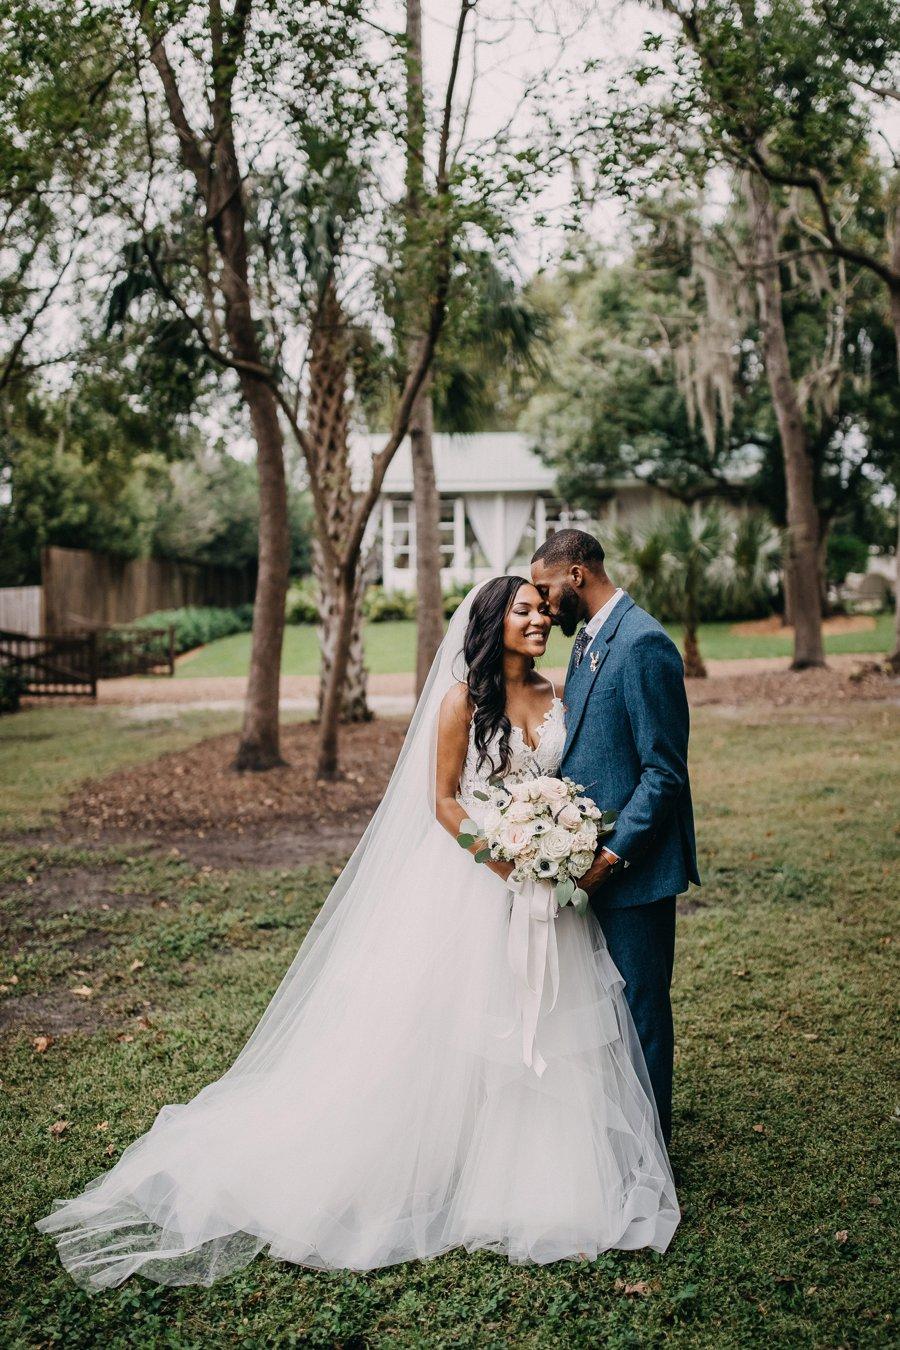 A Navy & Blush Rustic Elegant Central Florida Wedding via TheELD.com